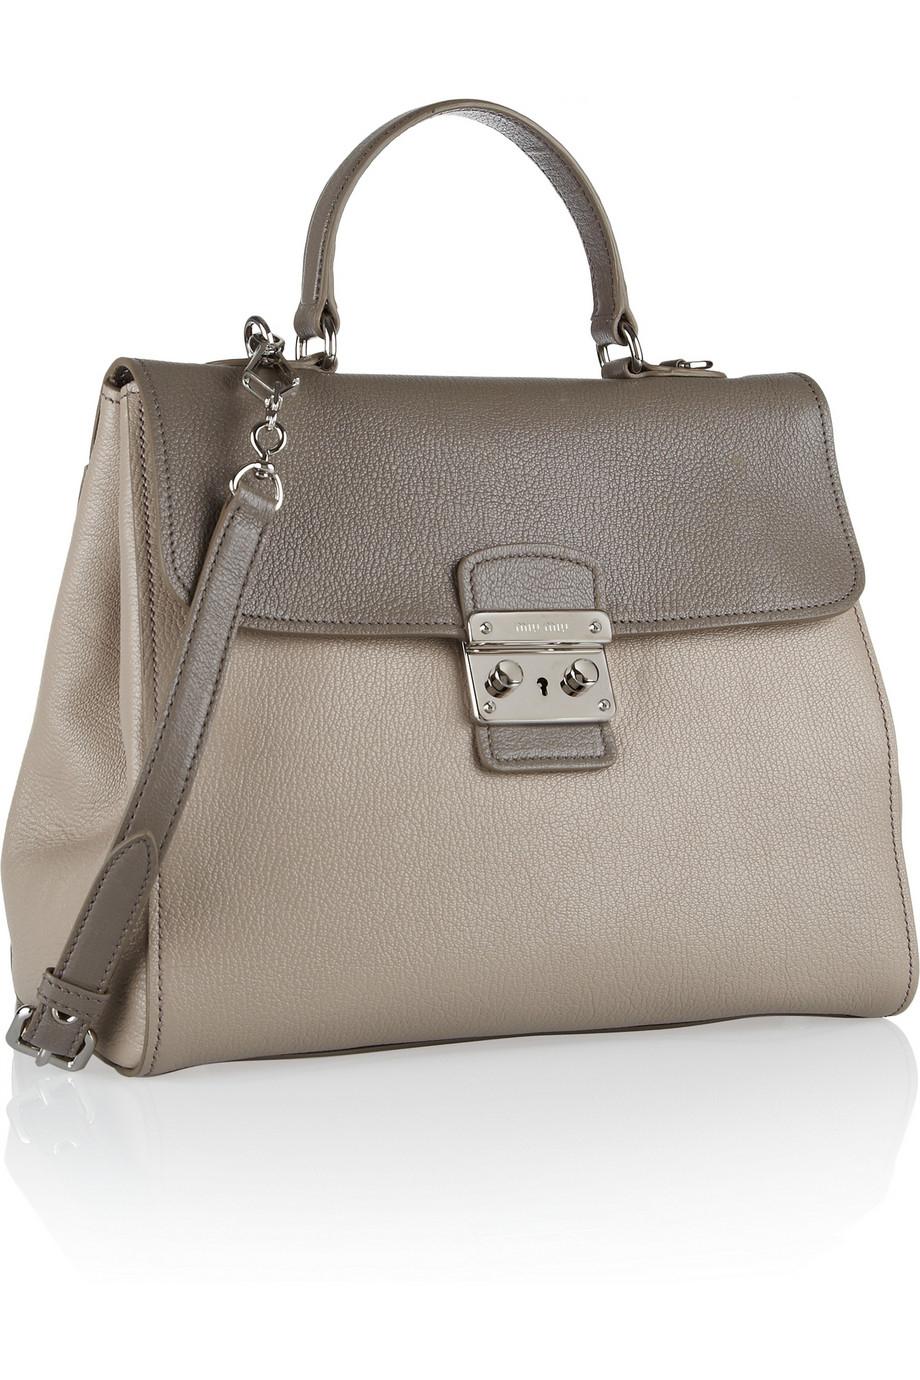 f30f4b4d1d6a Miu Miu Pattina Madras Two-Tone Textured-Leather Shoulder Bag in ...